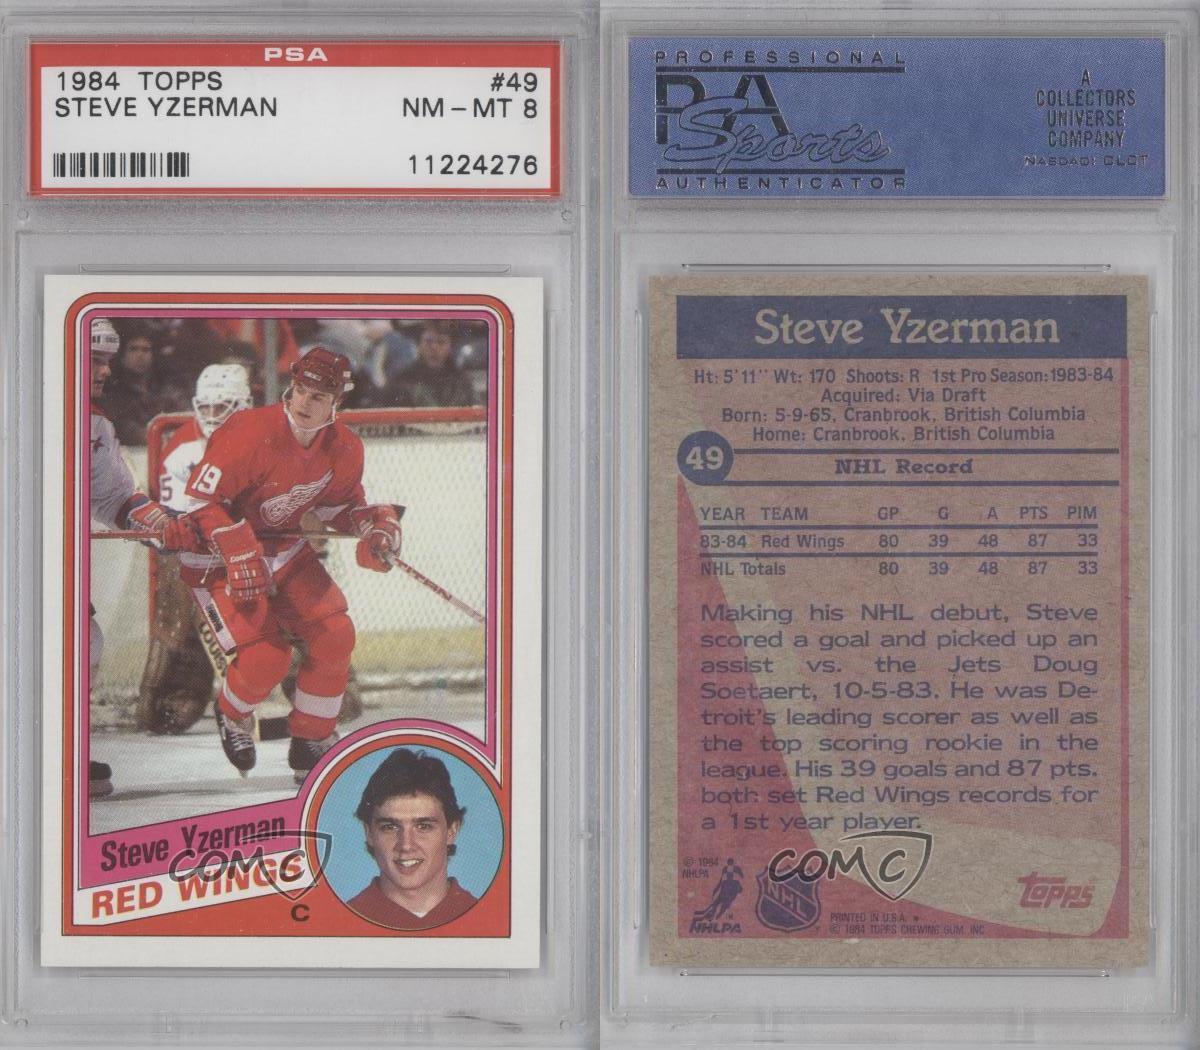 1984-85 Topps #49 Steve Yzerman PSA 8 Detroit Red Wings RC